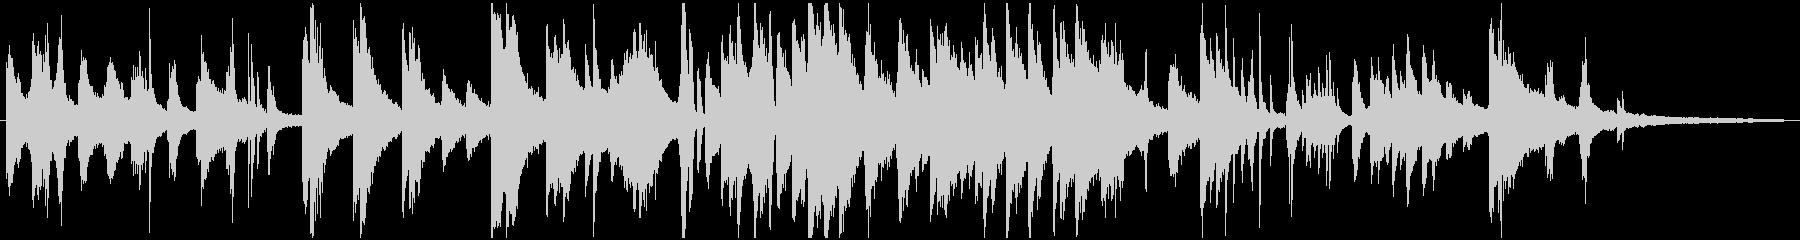 Jazzy Piano Improvisation 1の未再生の波形